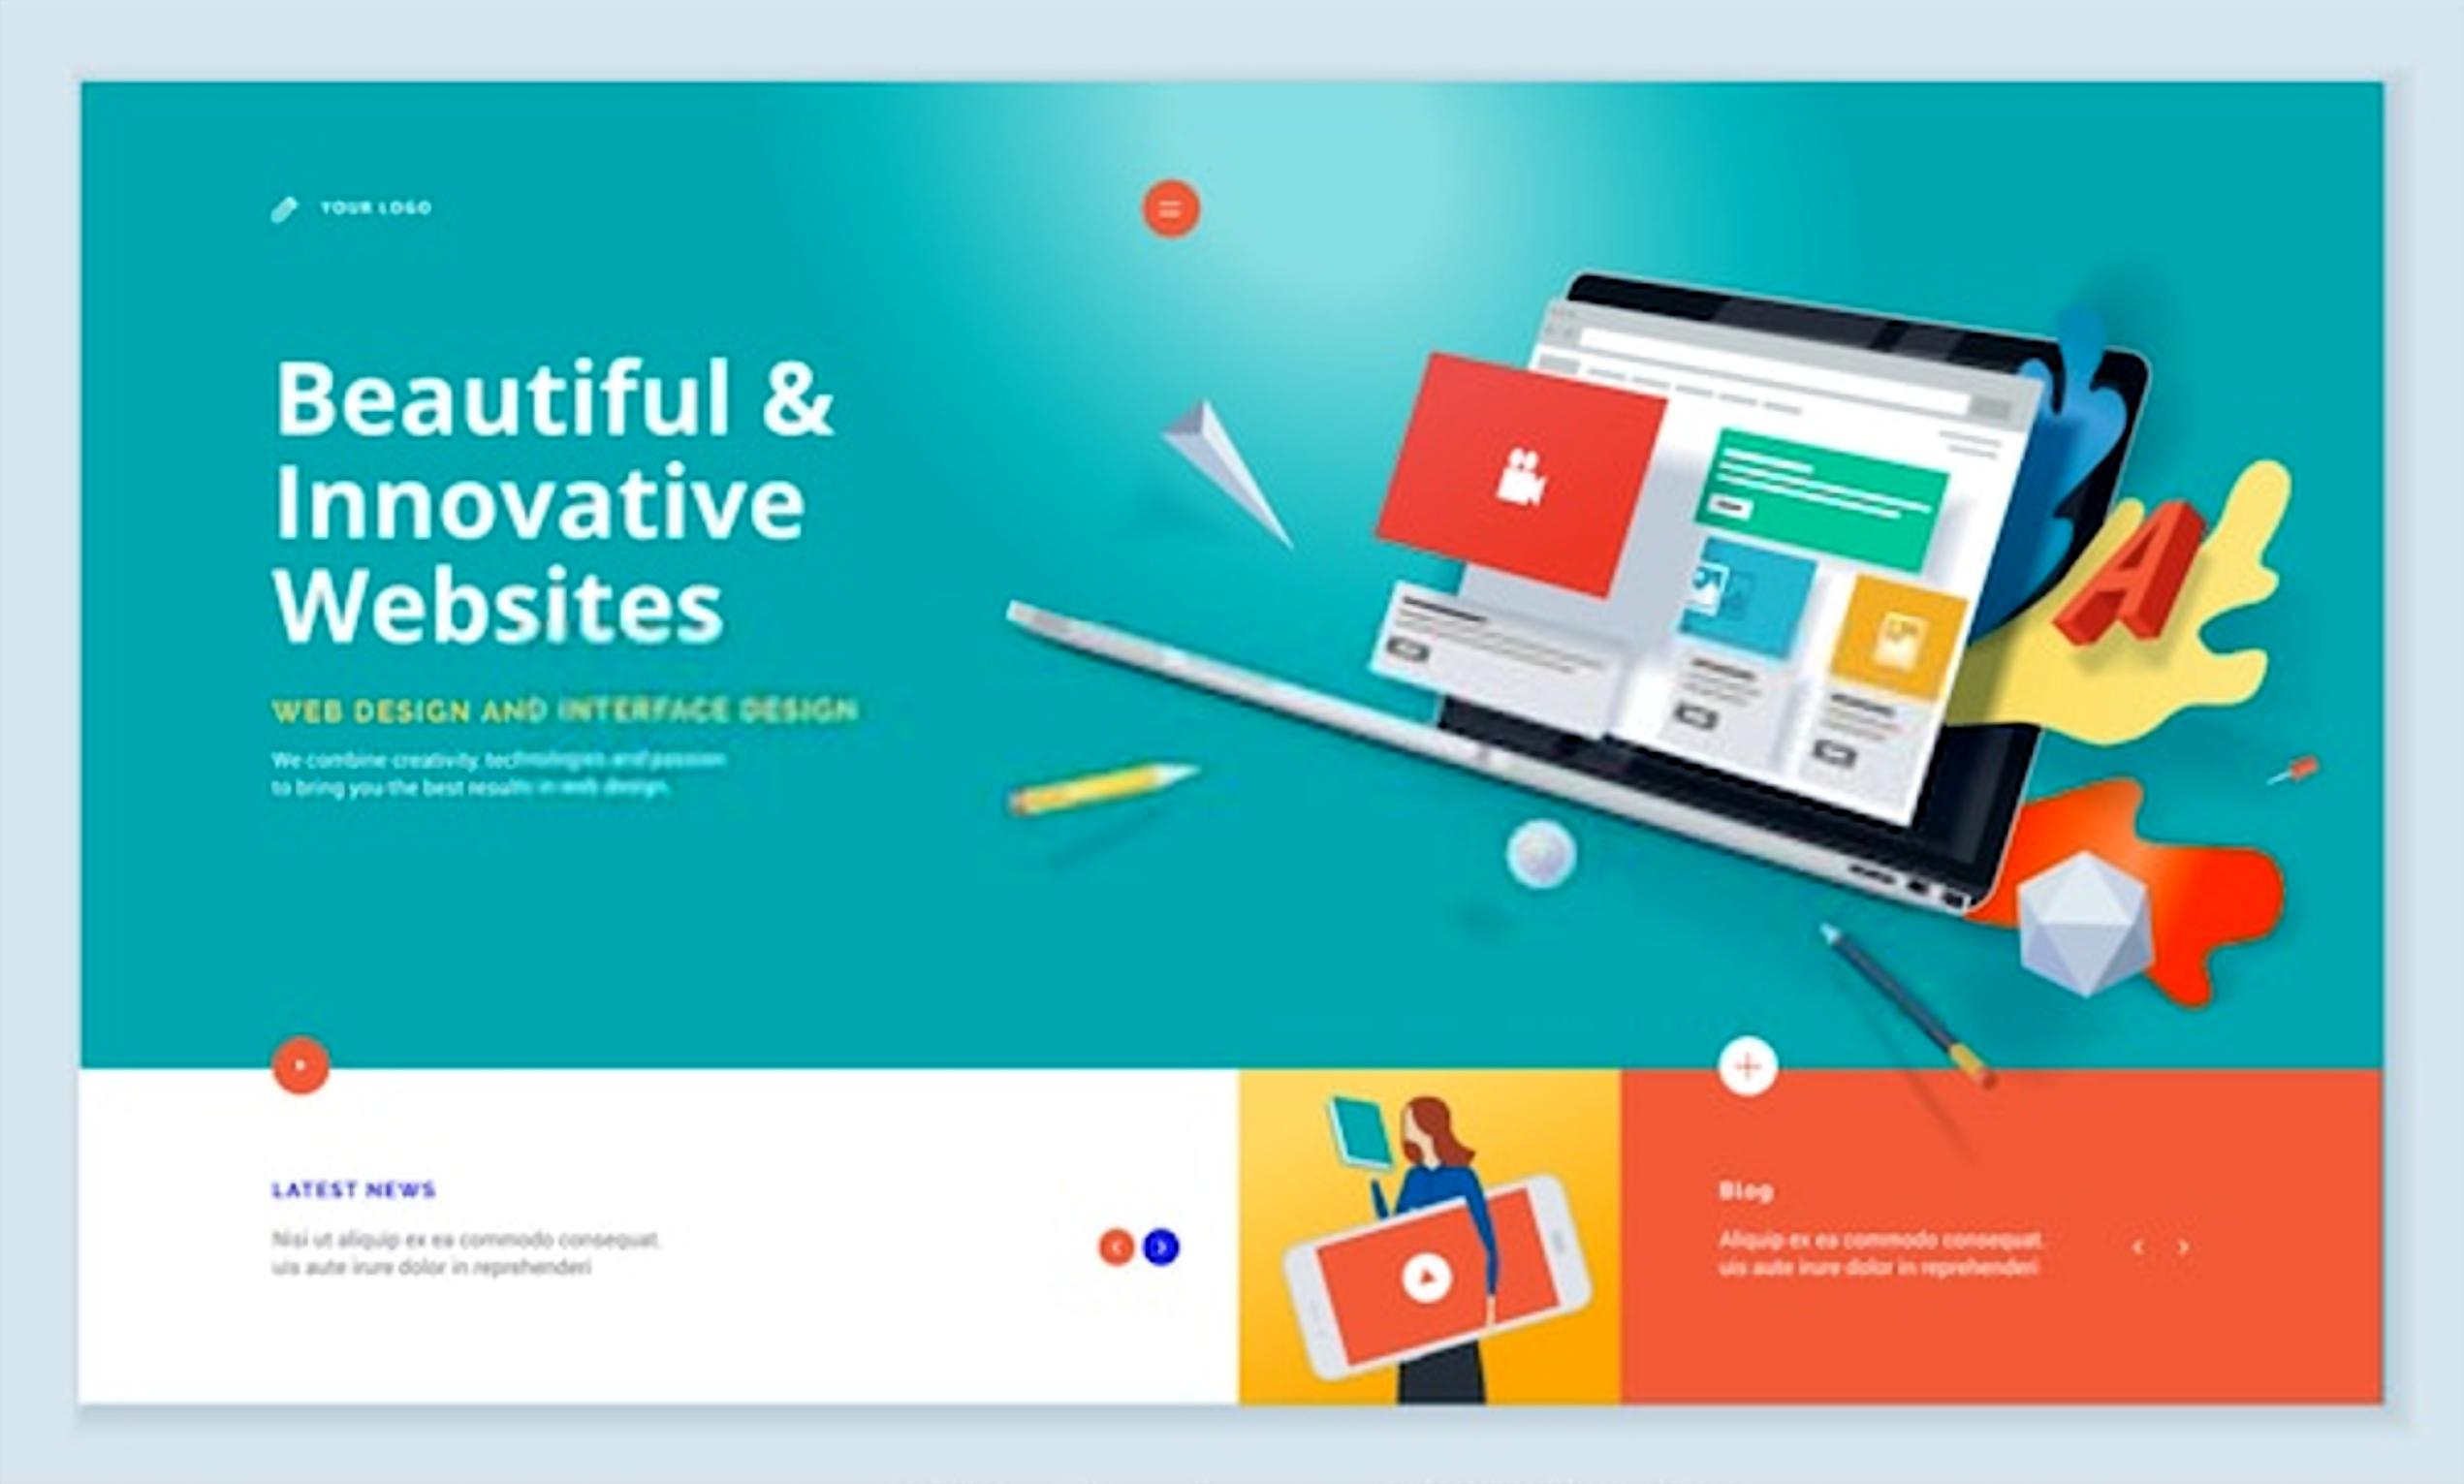 Innovative Web Design In 2020 Website Template Design Innovative Websites Web Design